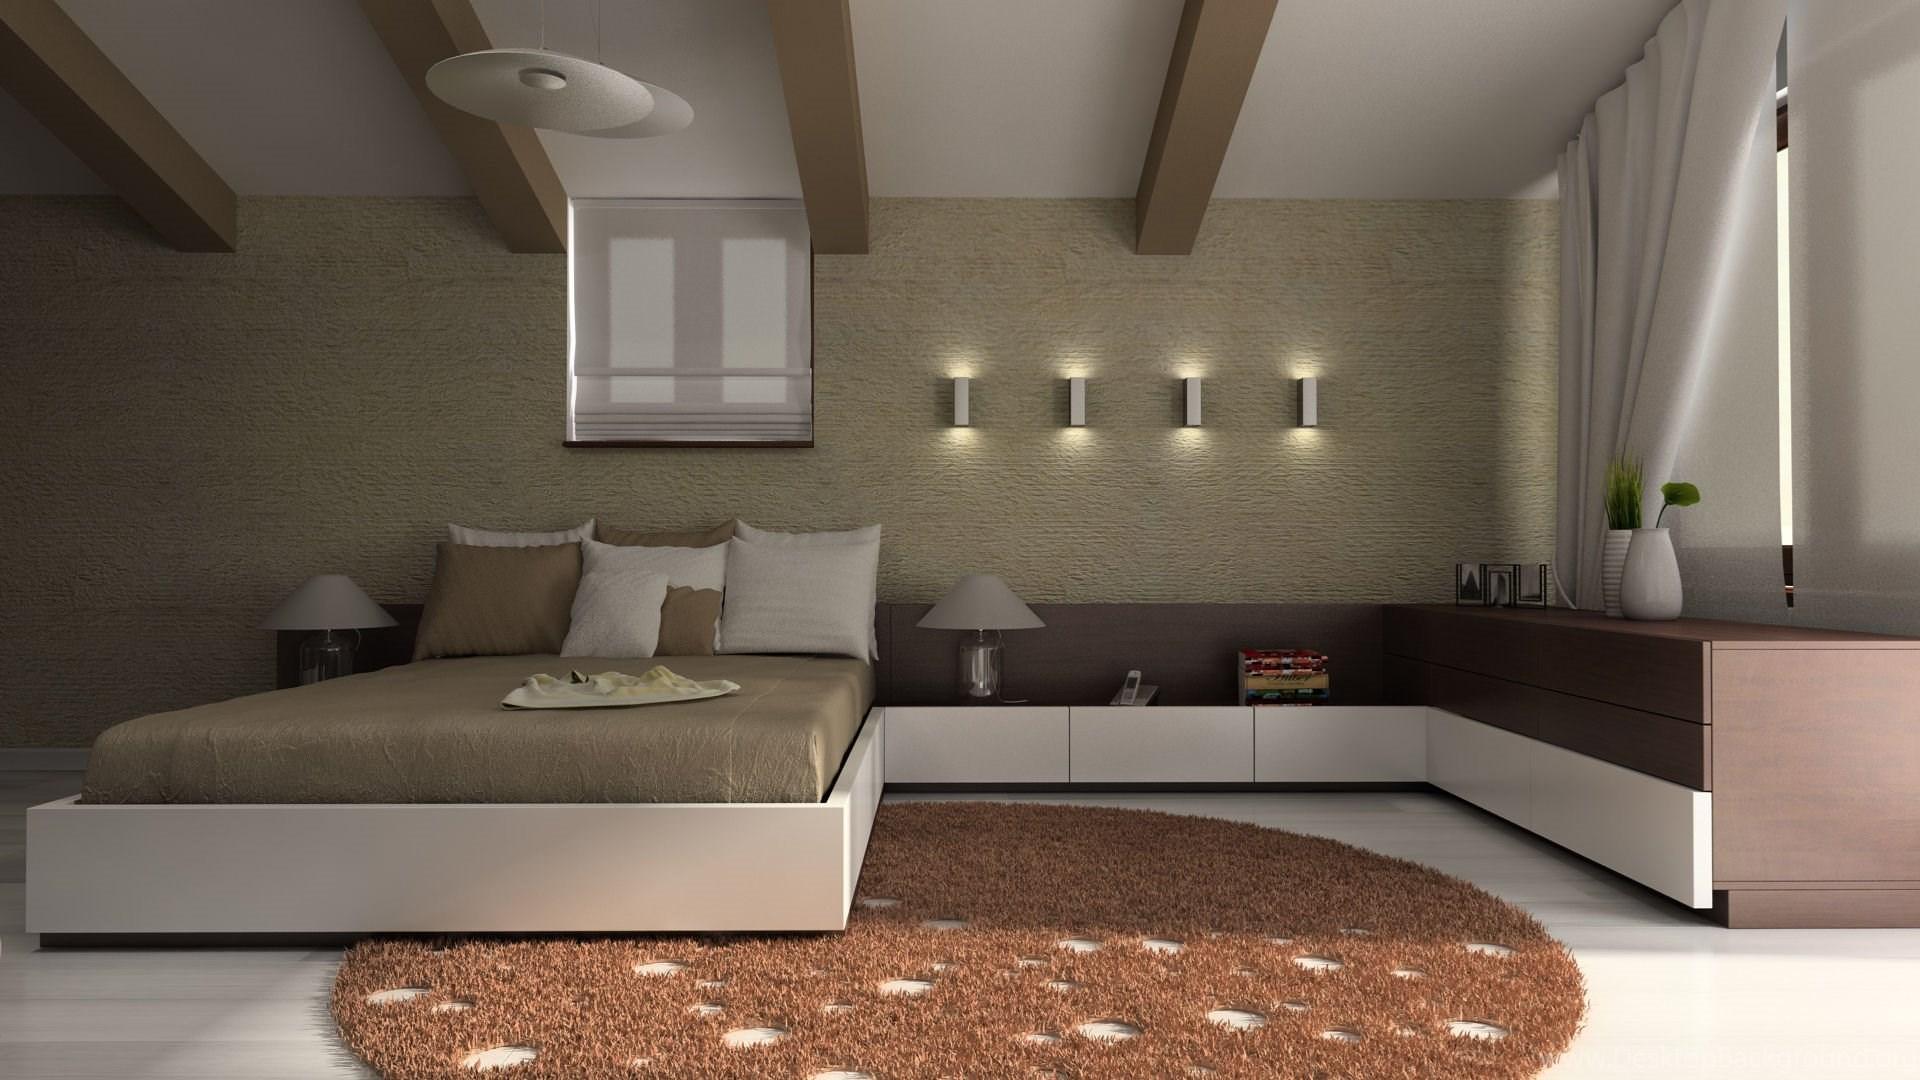 Home Interiors Hd Wallpapers Best Home Interior Design Websites ...